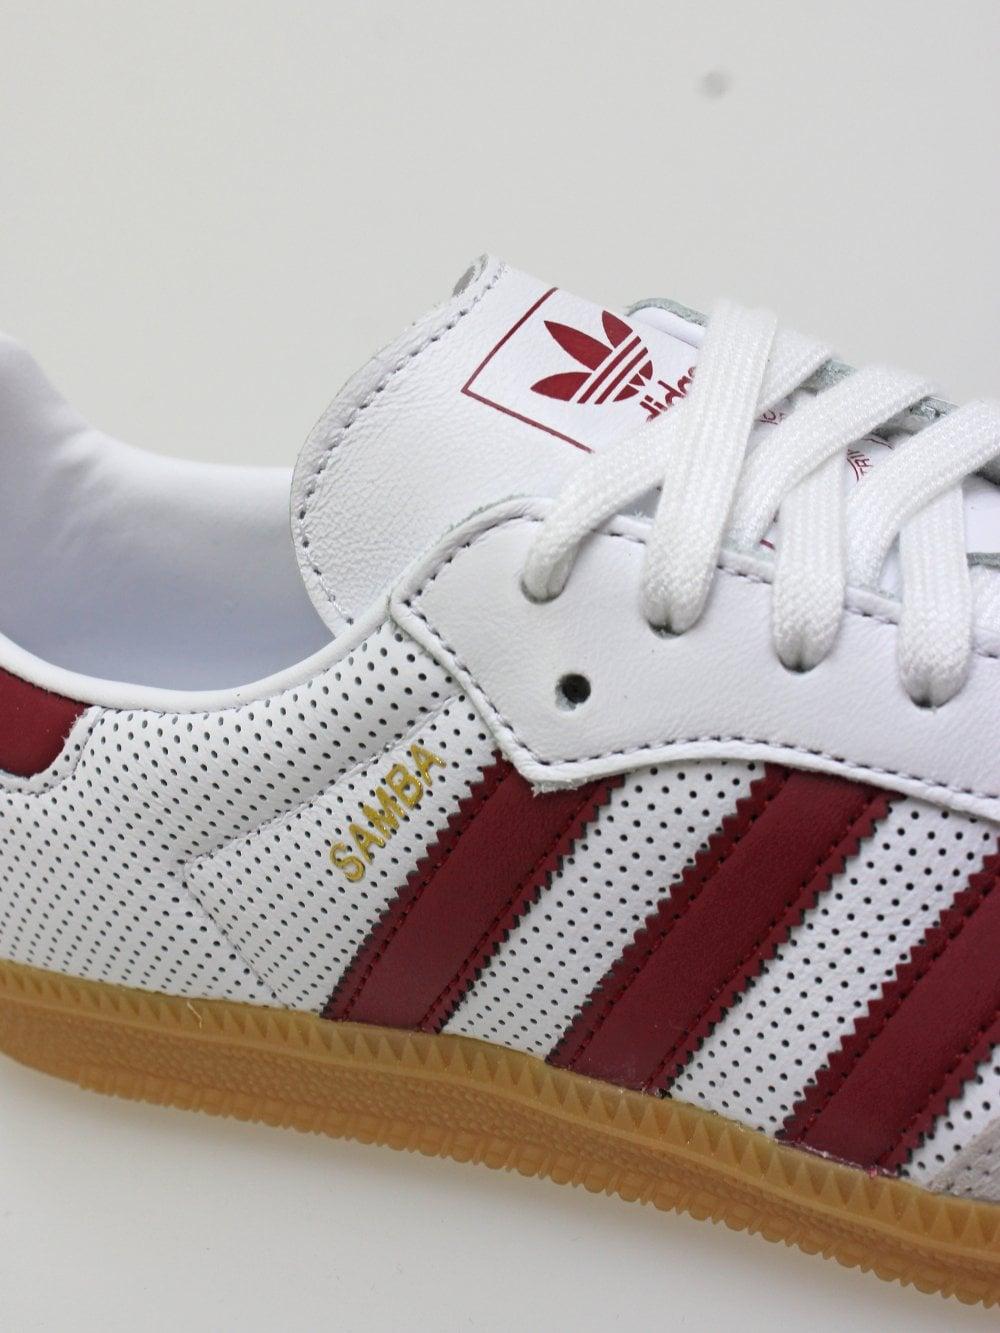 adidas Samba OG in White/Burgundy